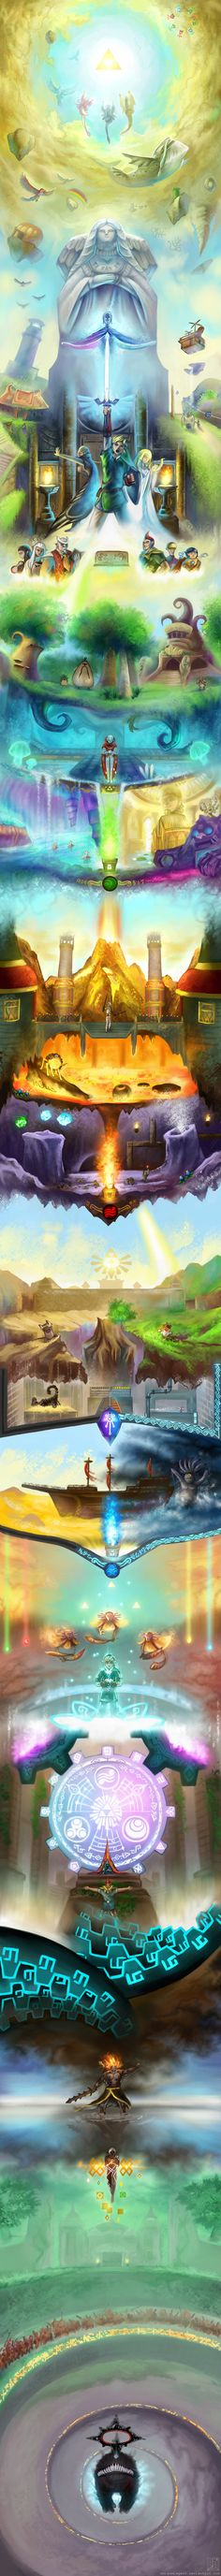 The Legend of Zelda - Skyward Sword by uniqueLegend.deviantart.com    ( I DUNNO WHAT MY FEELINGS ARE DOING!)